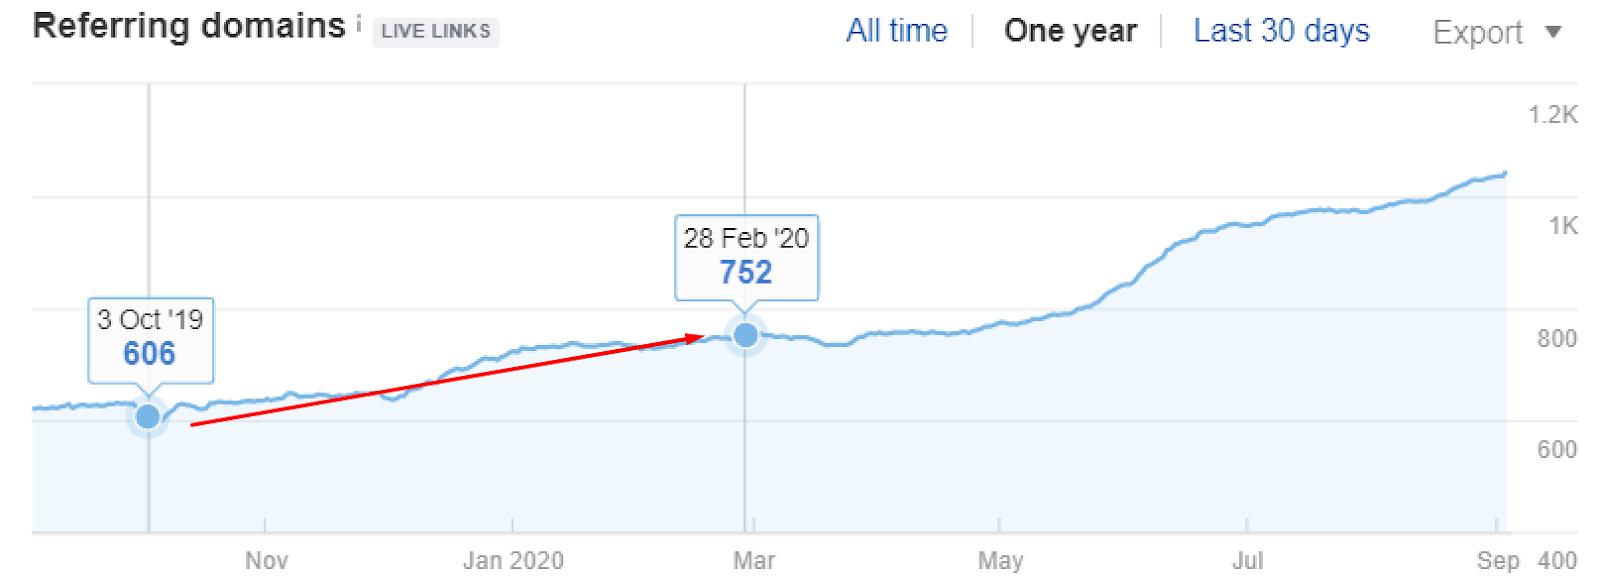 Organic traffic from Oct 3, 2019 vs. Feb 28, 2020